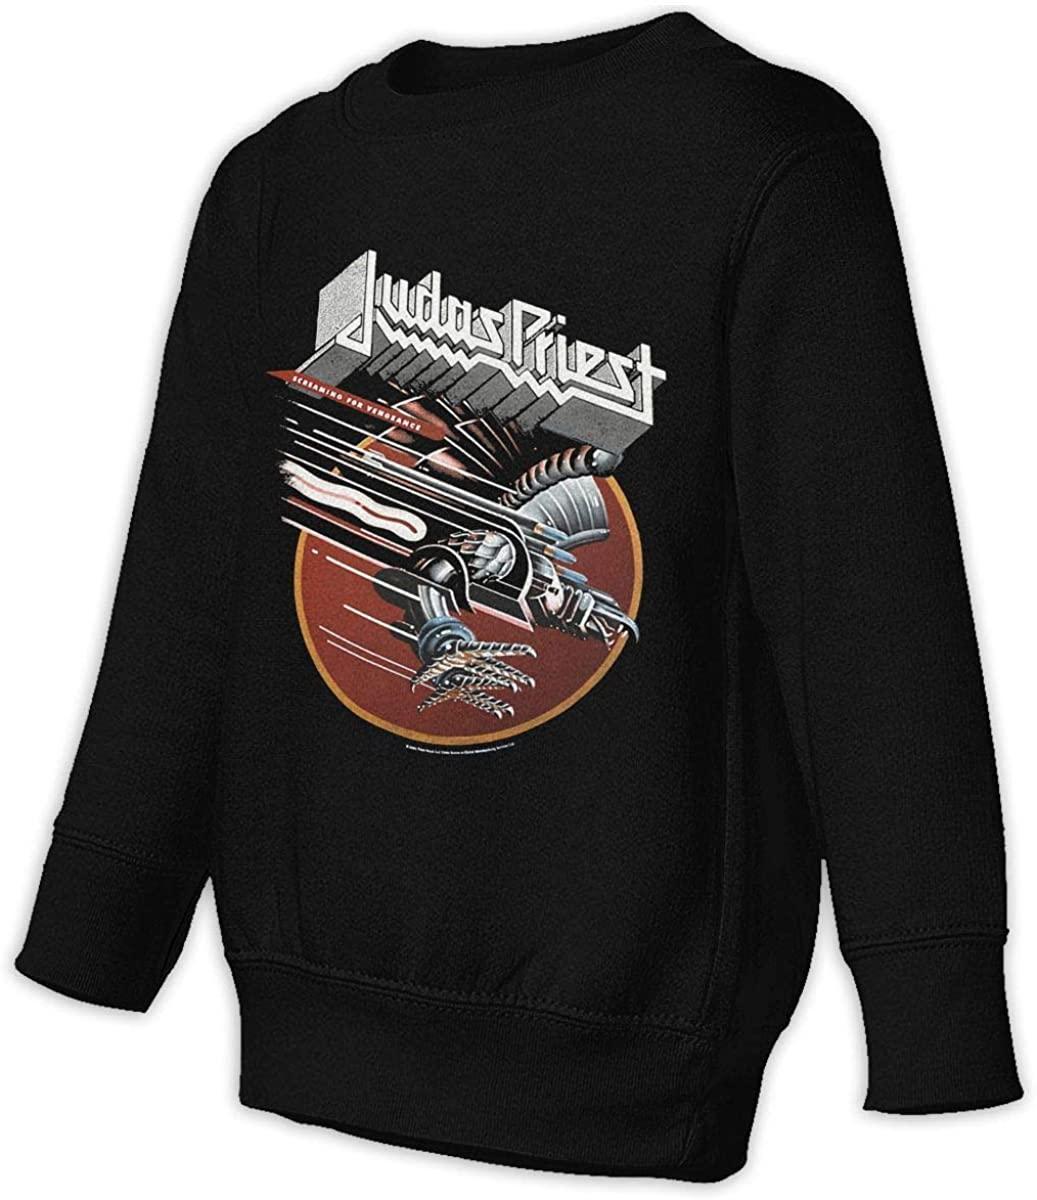 NOT Judas Priest Unisex Sweatshirt Youth Boy and Girls Pullover Sweatshirt